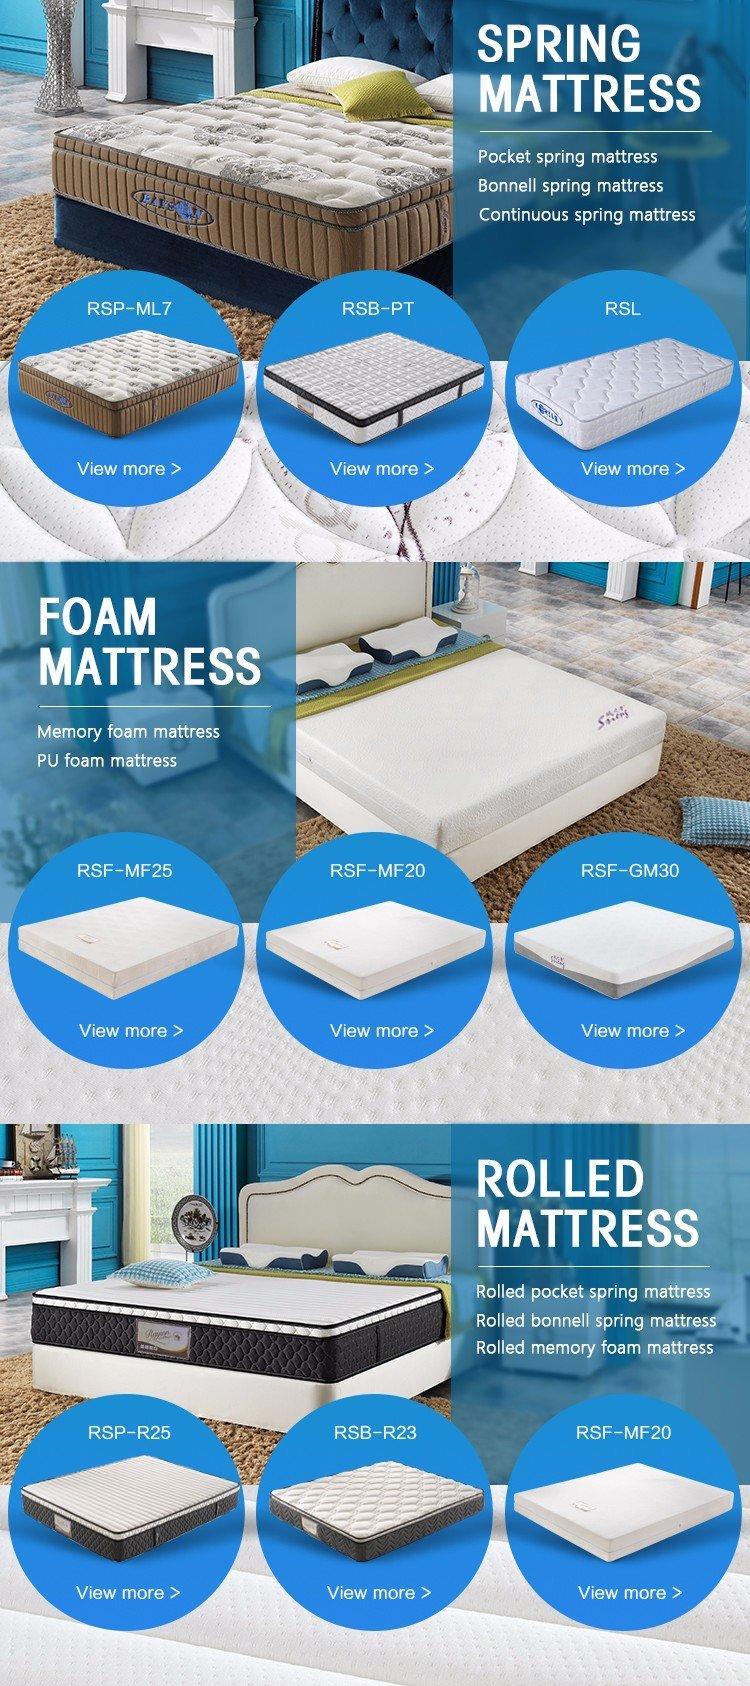 luxury bonnell spring mattress spring charcoal Rayson Mattress Brand company